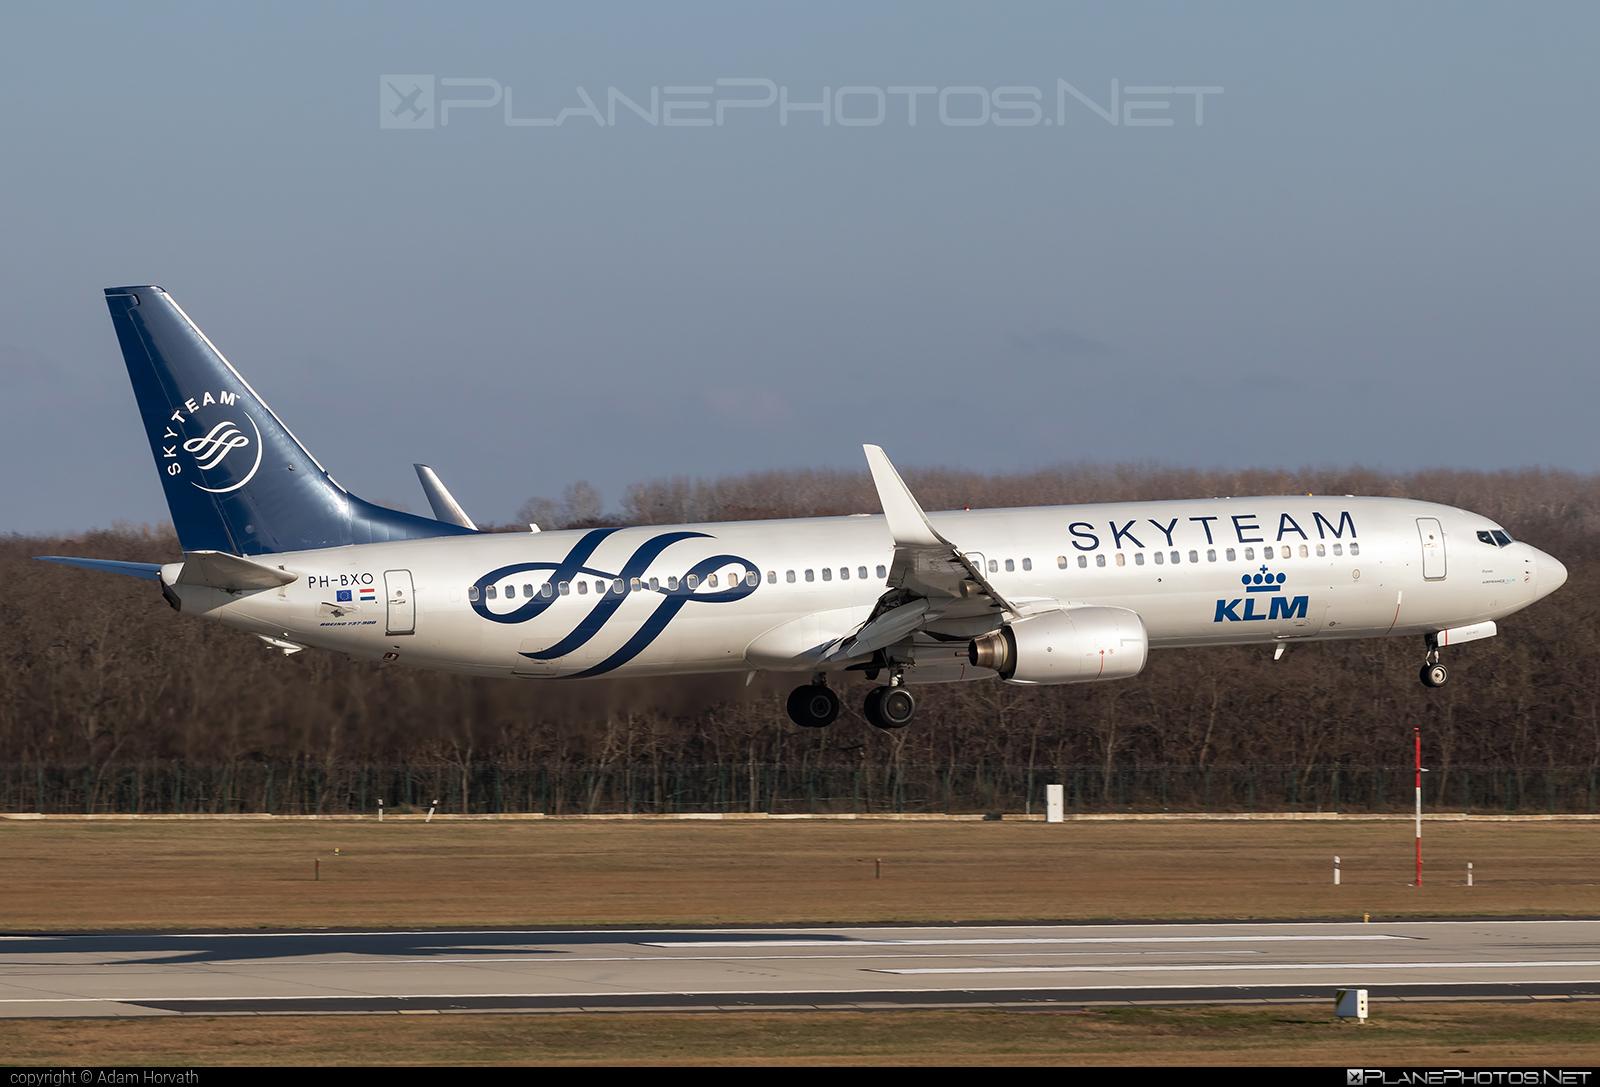 Boeing 737-900 - PH-BXO operated by KLM Royal Dutch Airlines #b737 #b737nextgen #b737ng #boeing #boeing737 #klm #klmroyaldutchairlines #royaldutchairlines #skyteam